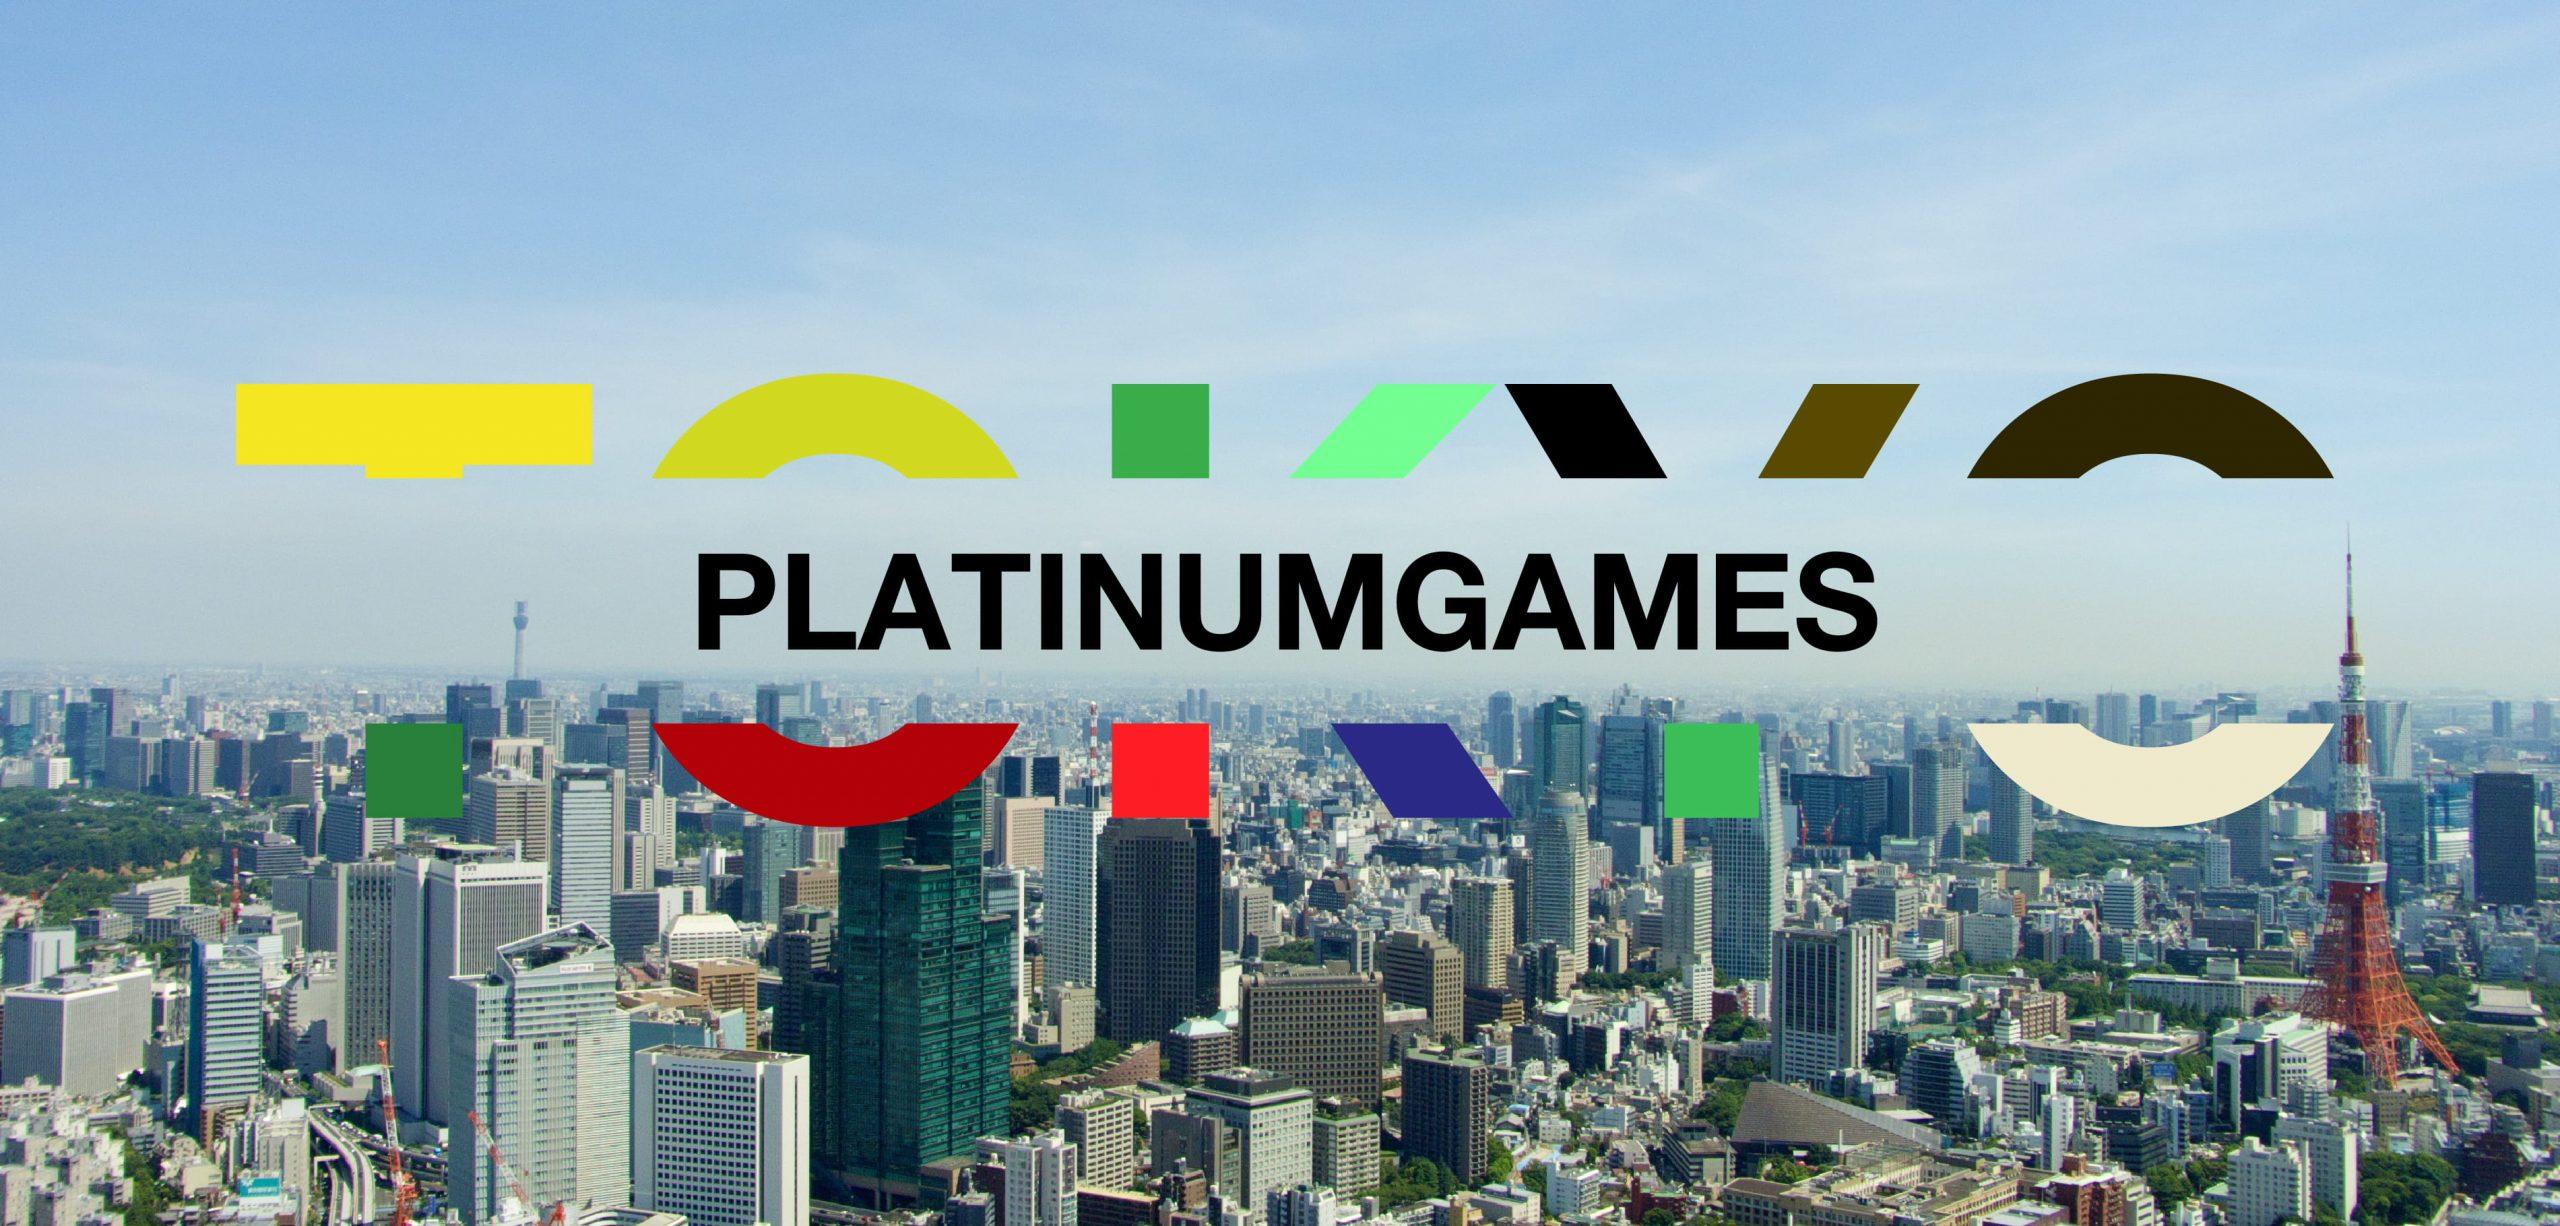 platinum-tokyo-scaled.jpg